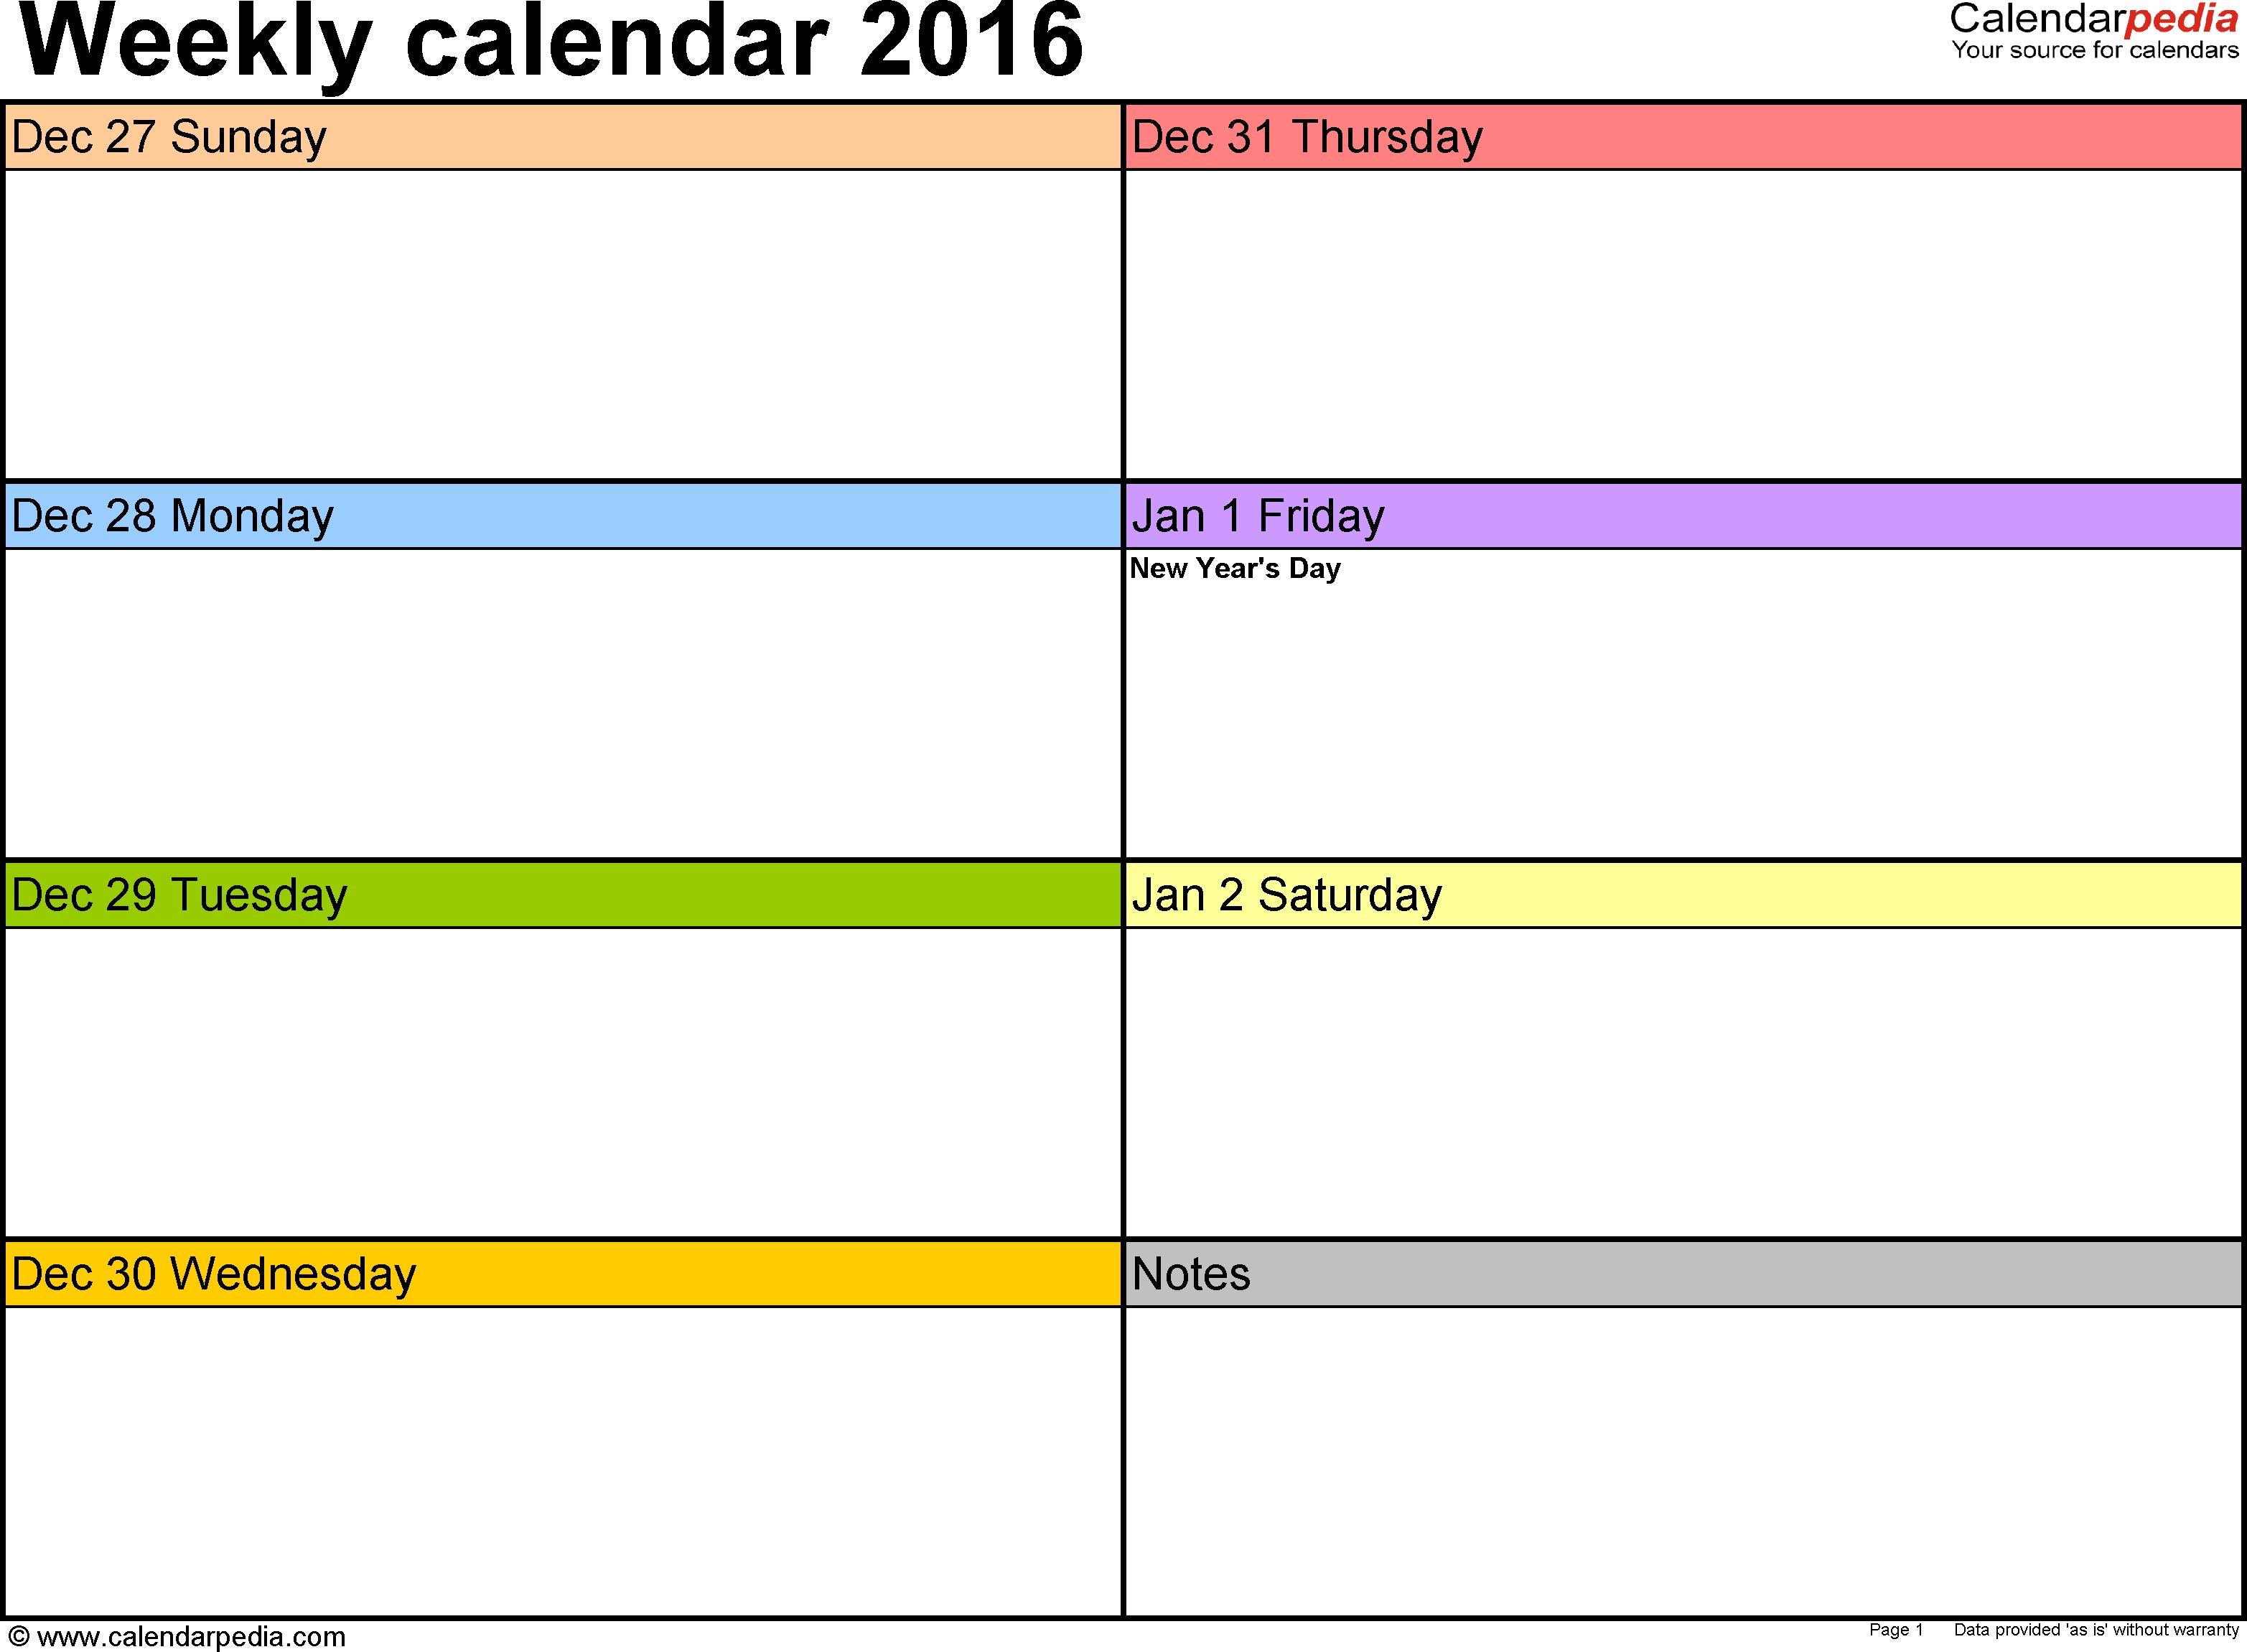 7 Days Weekly Planner Word Template Template Calendar Design